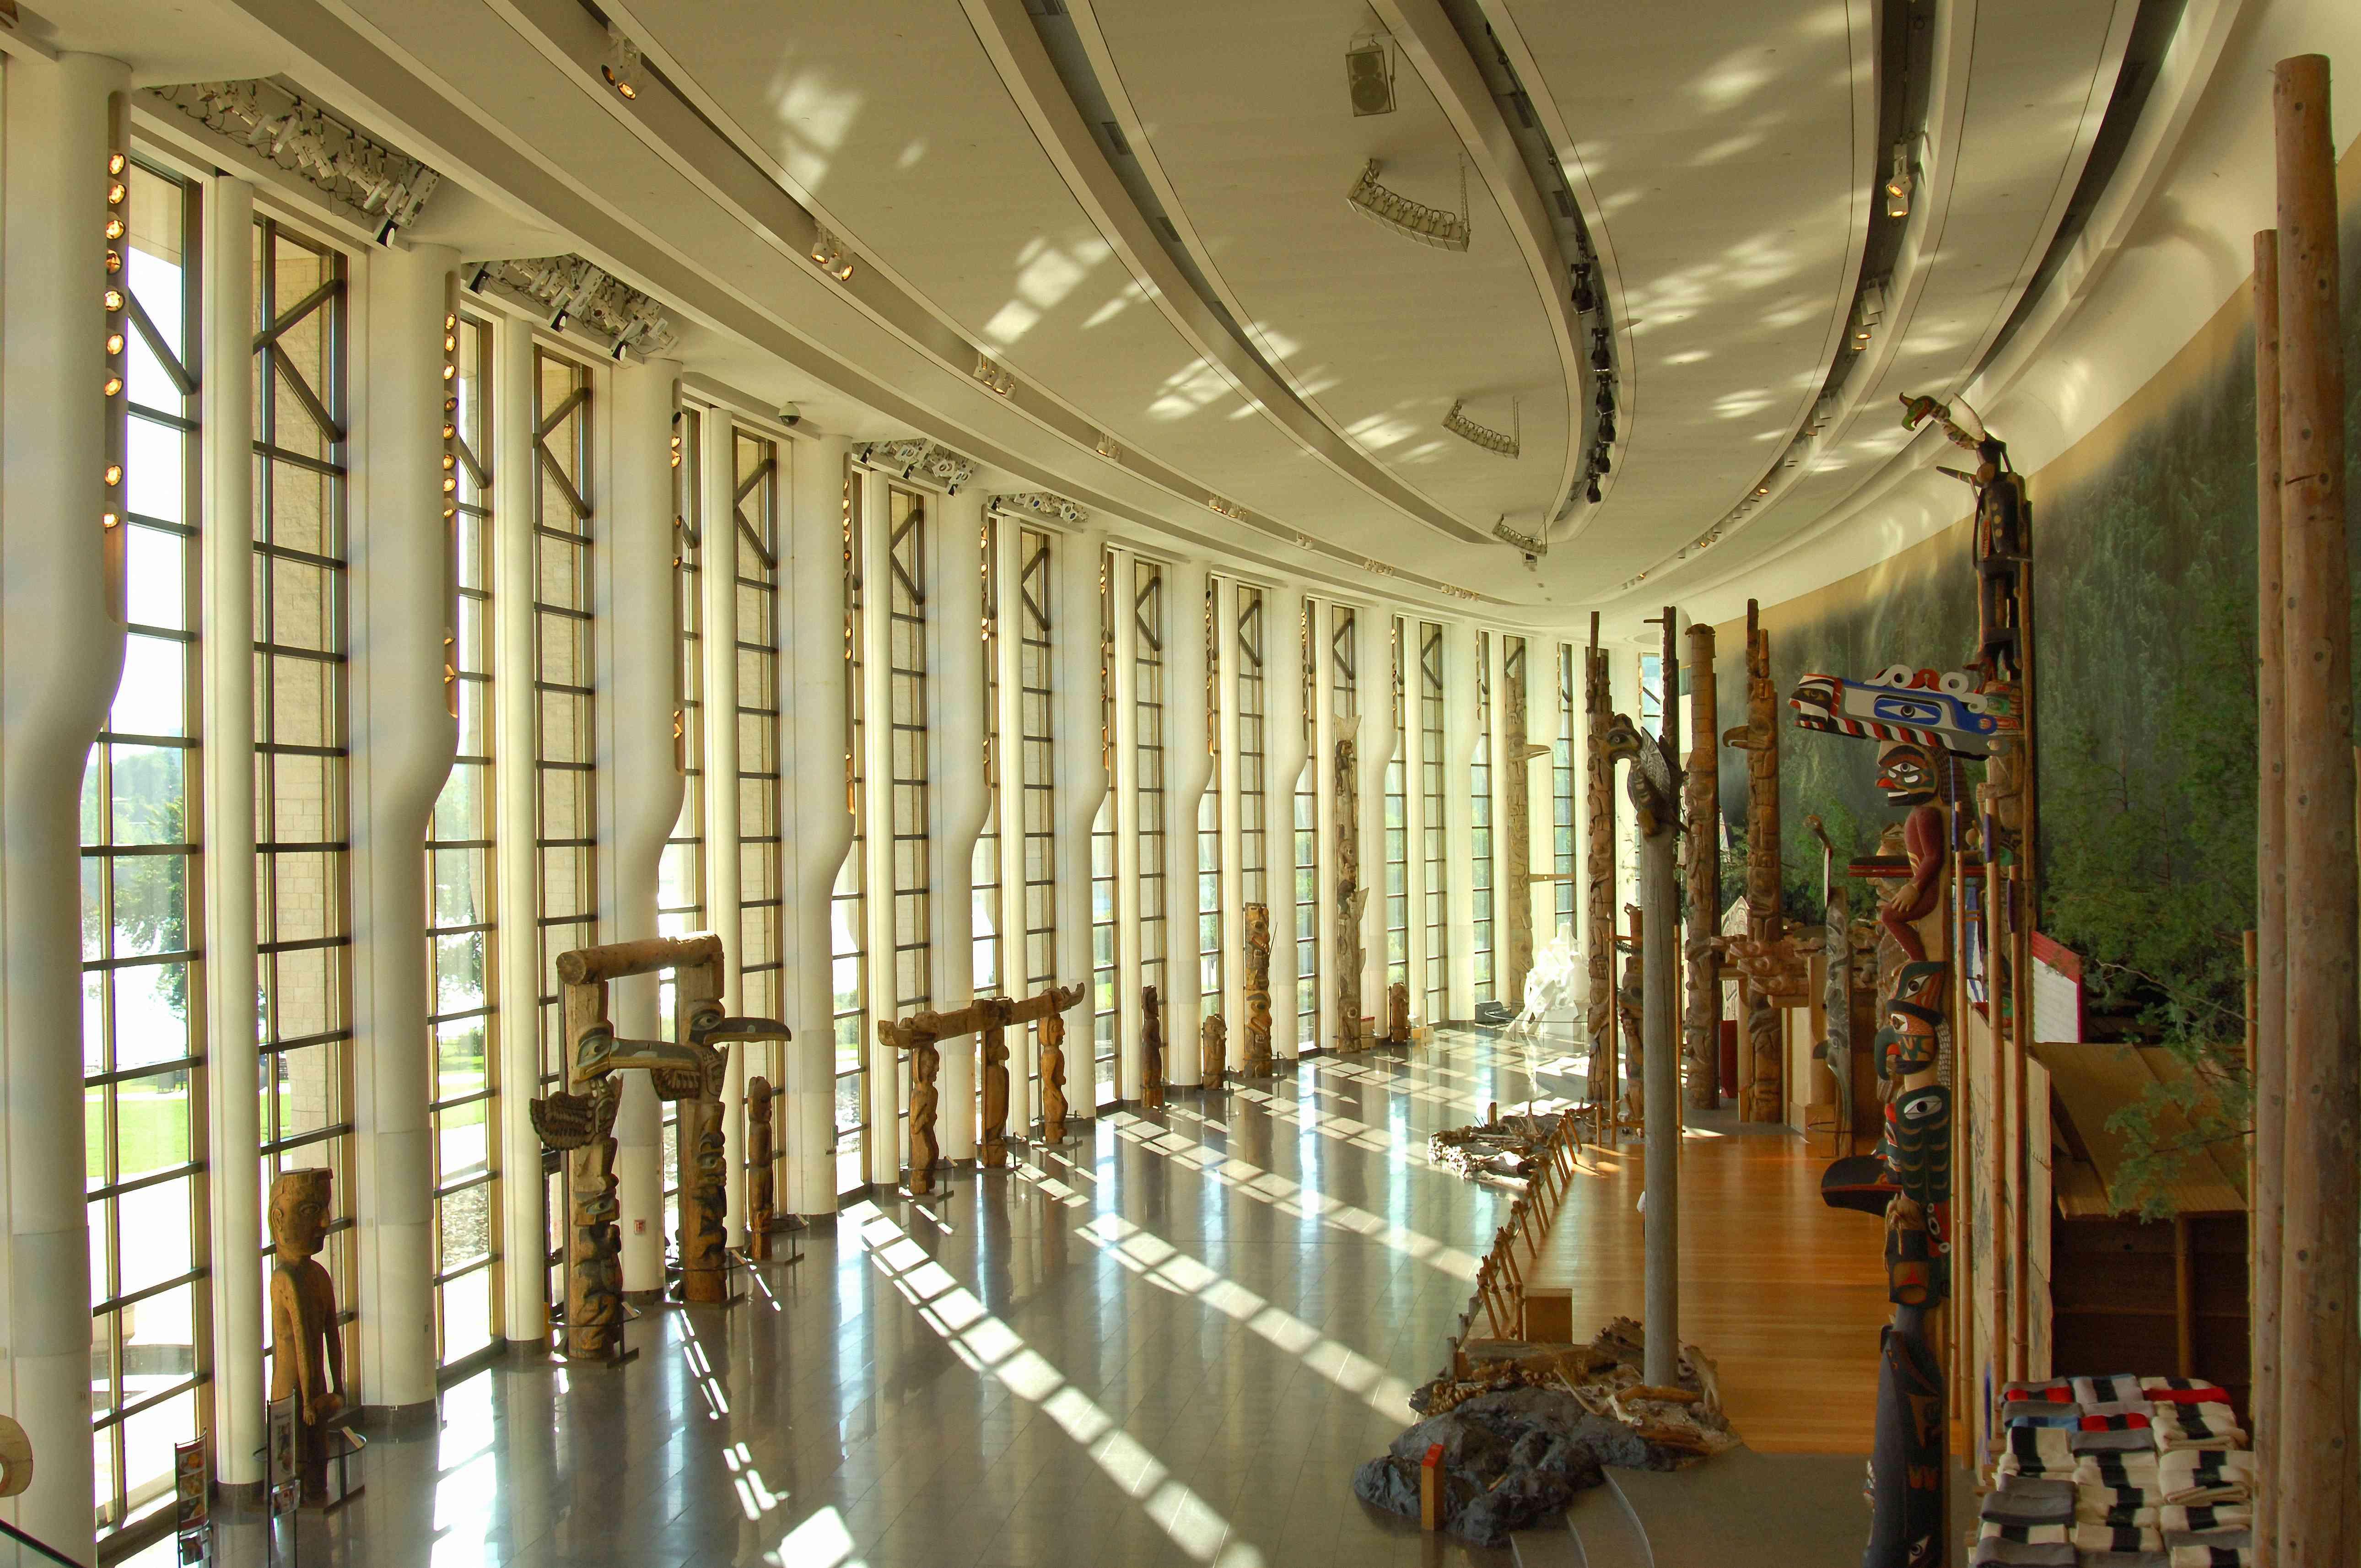 Canada's Museum of Civilization